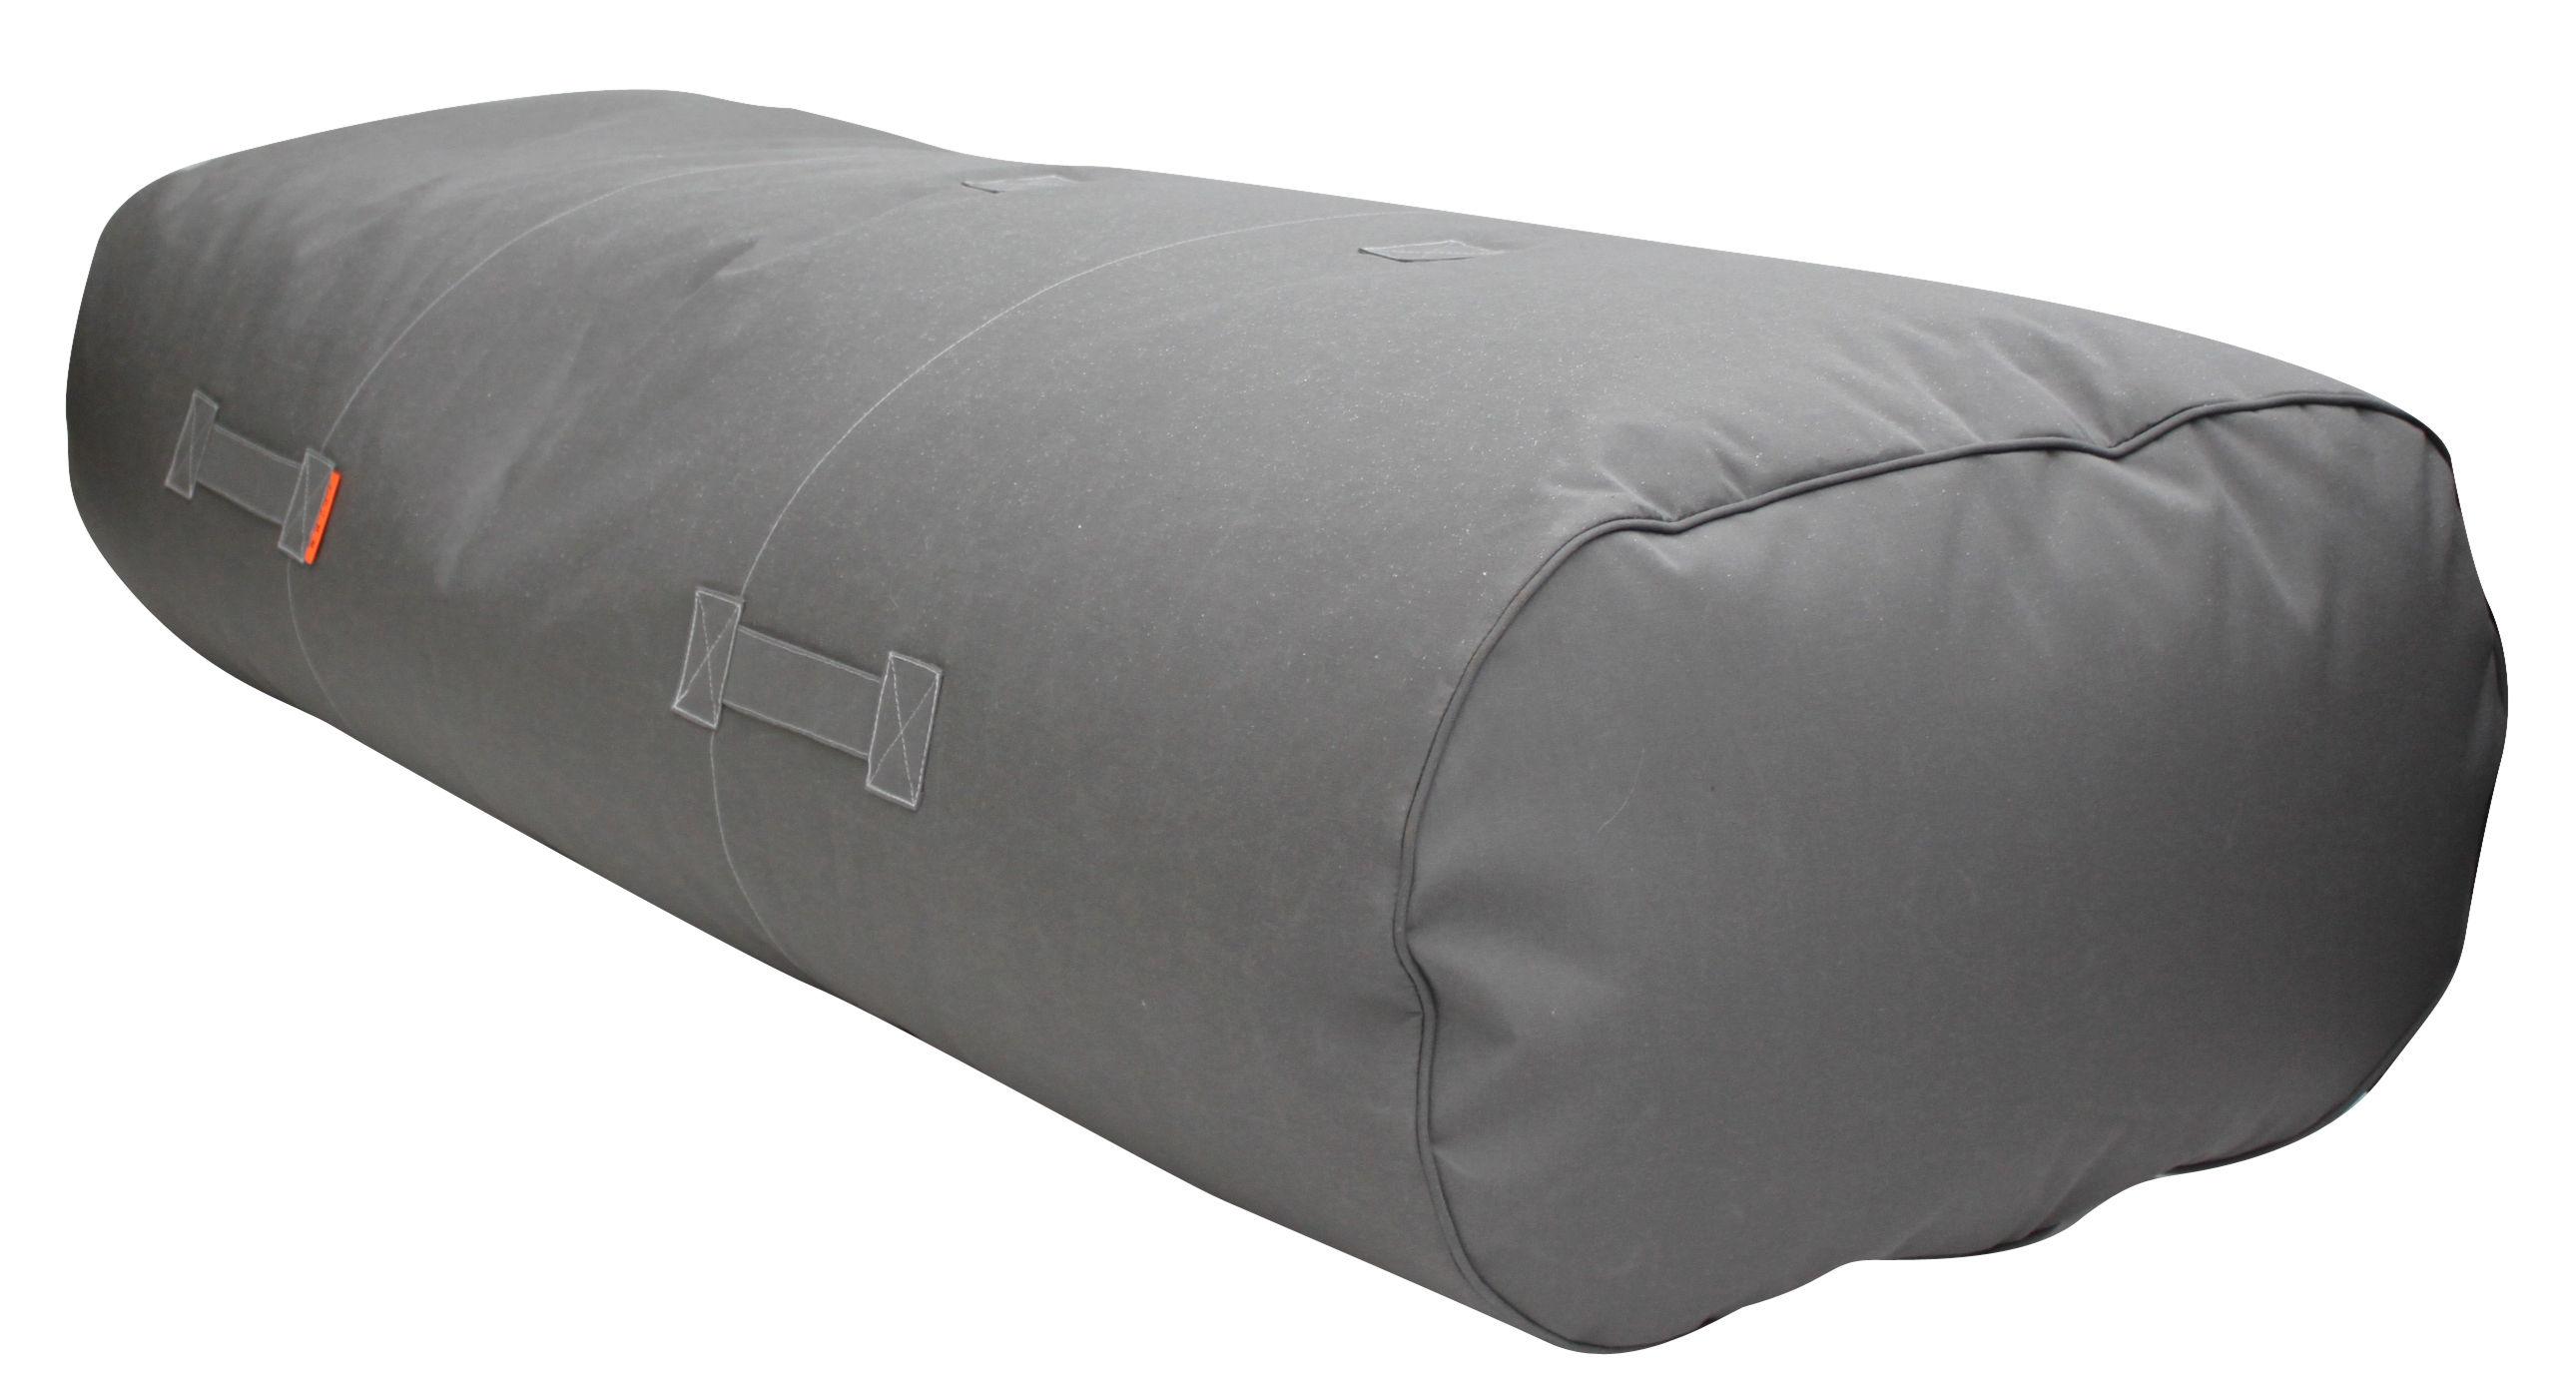 Furniture - Poufs & Floor Cushions - Rocket Bench - L 180 cm - 3 seaters by Trimm Copenhagen - Grey - Cloth